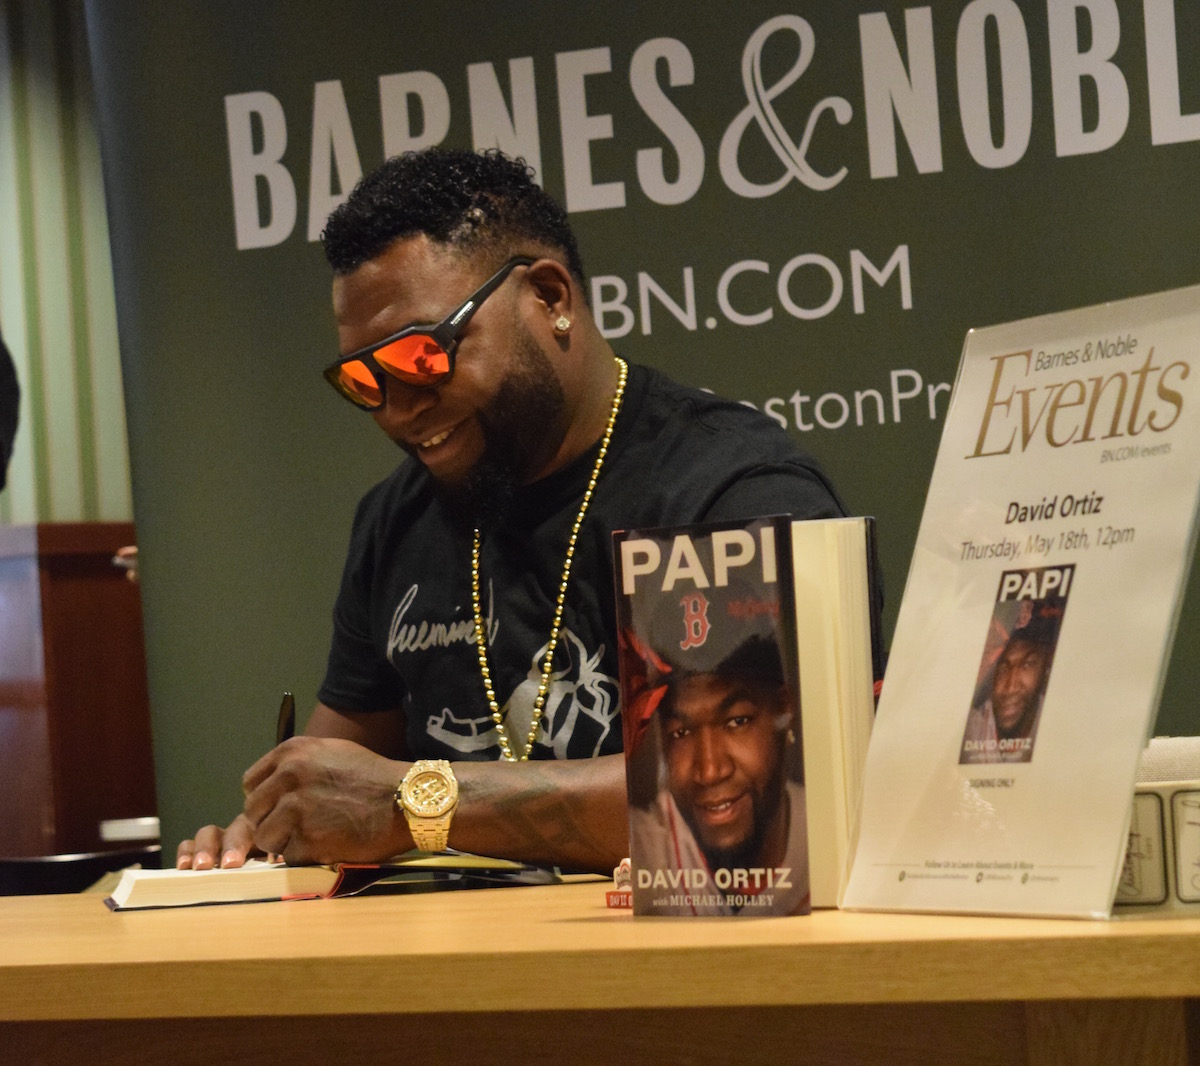 David Ortiz at book signing